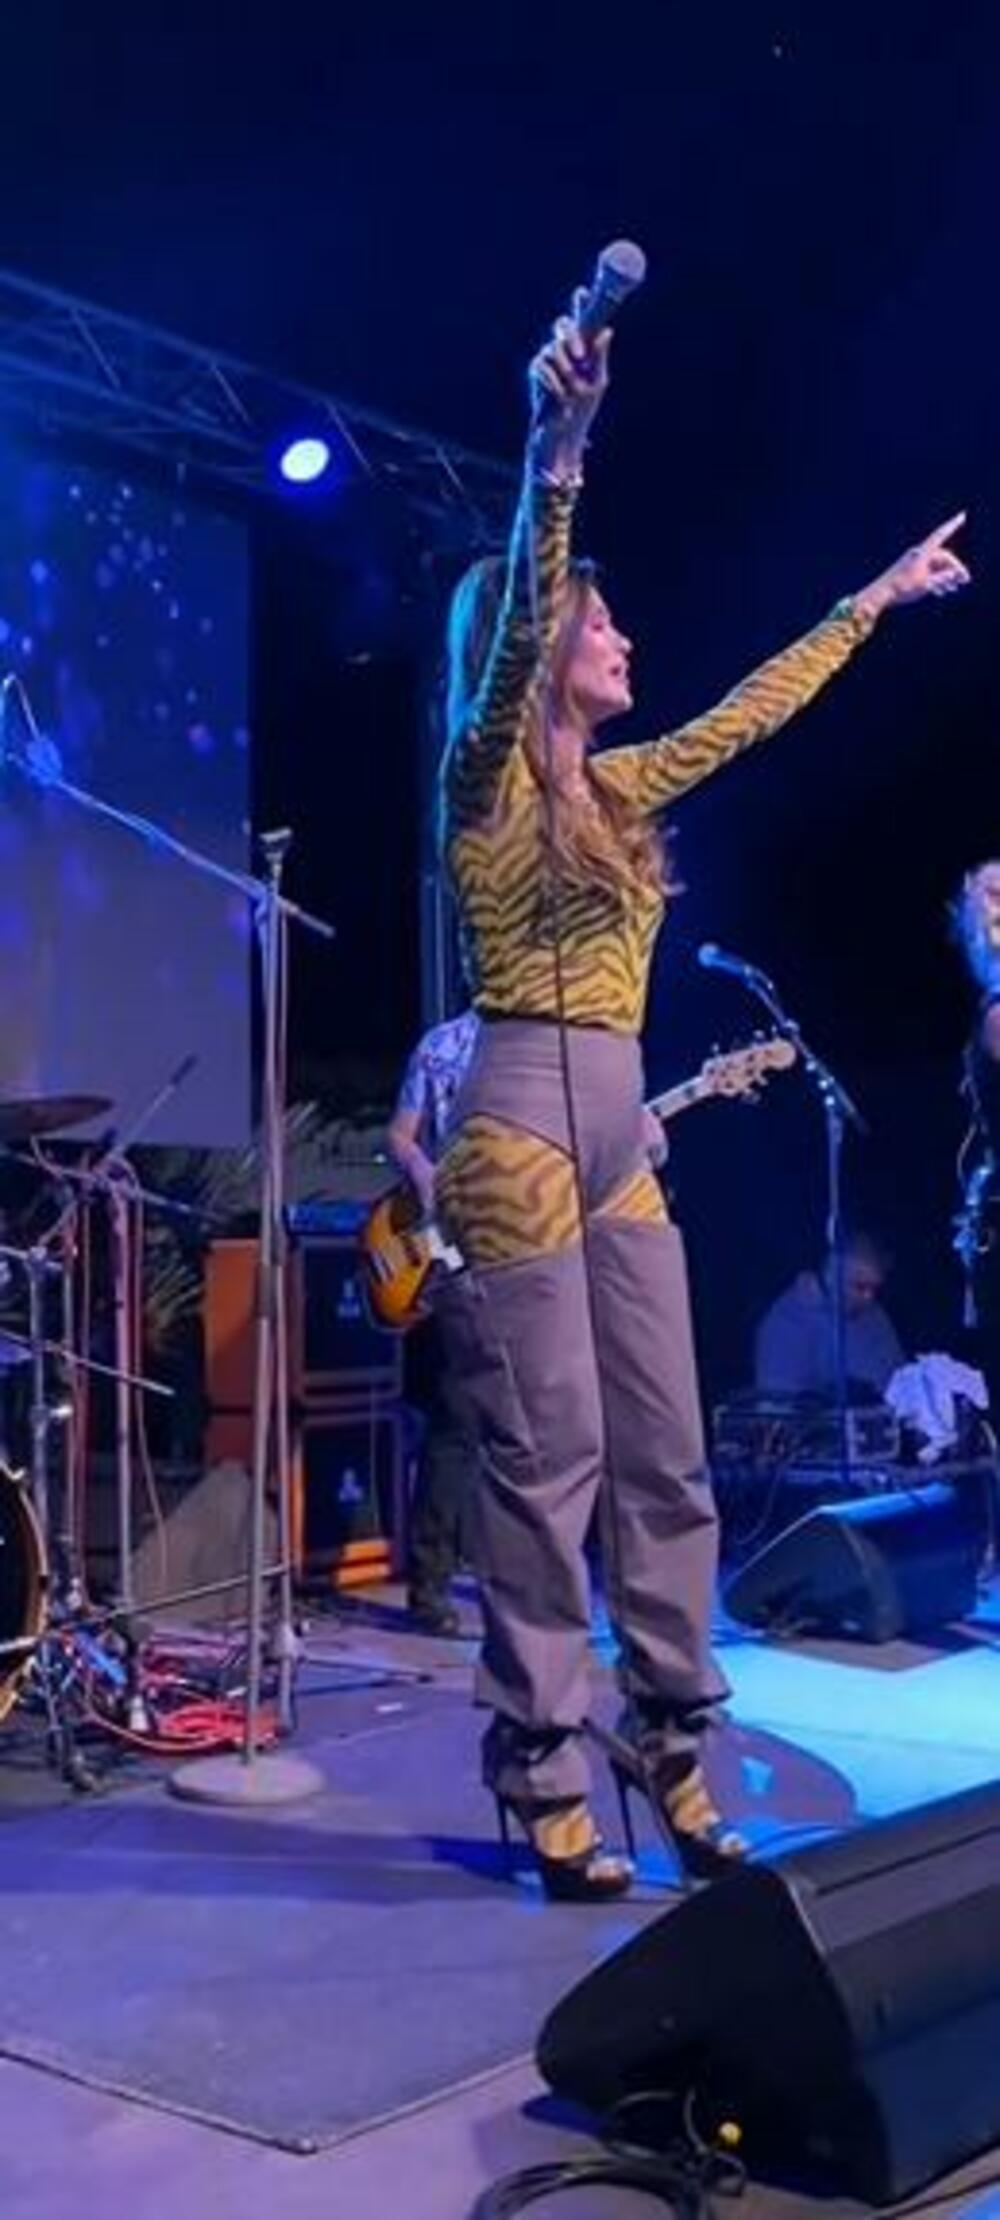 <p><strong>Pevačica </strong>je za jedan svoj nastup odabrala da obuče sličan odevni komad koji je svojevremeno nosila i<strong> Rijana</strong></p>